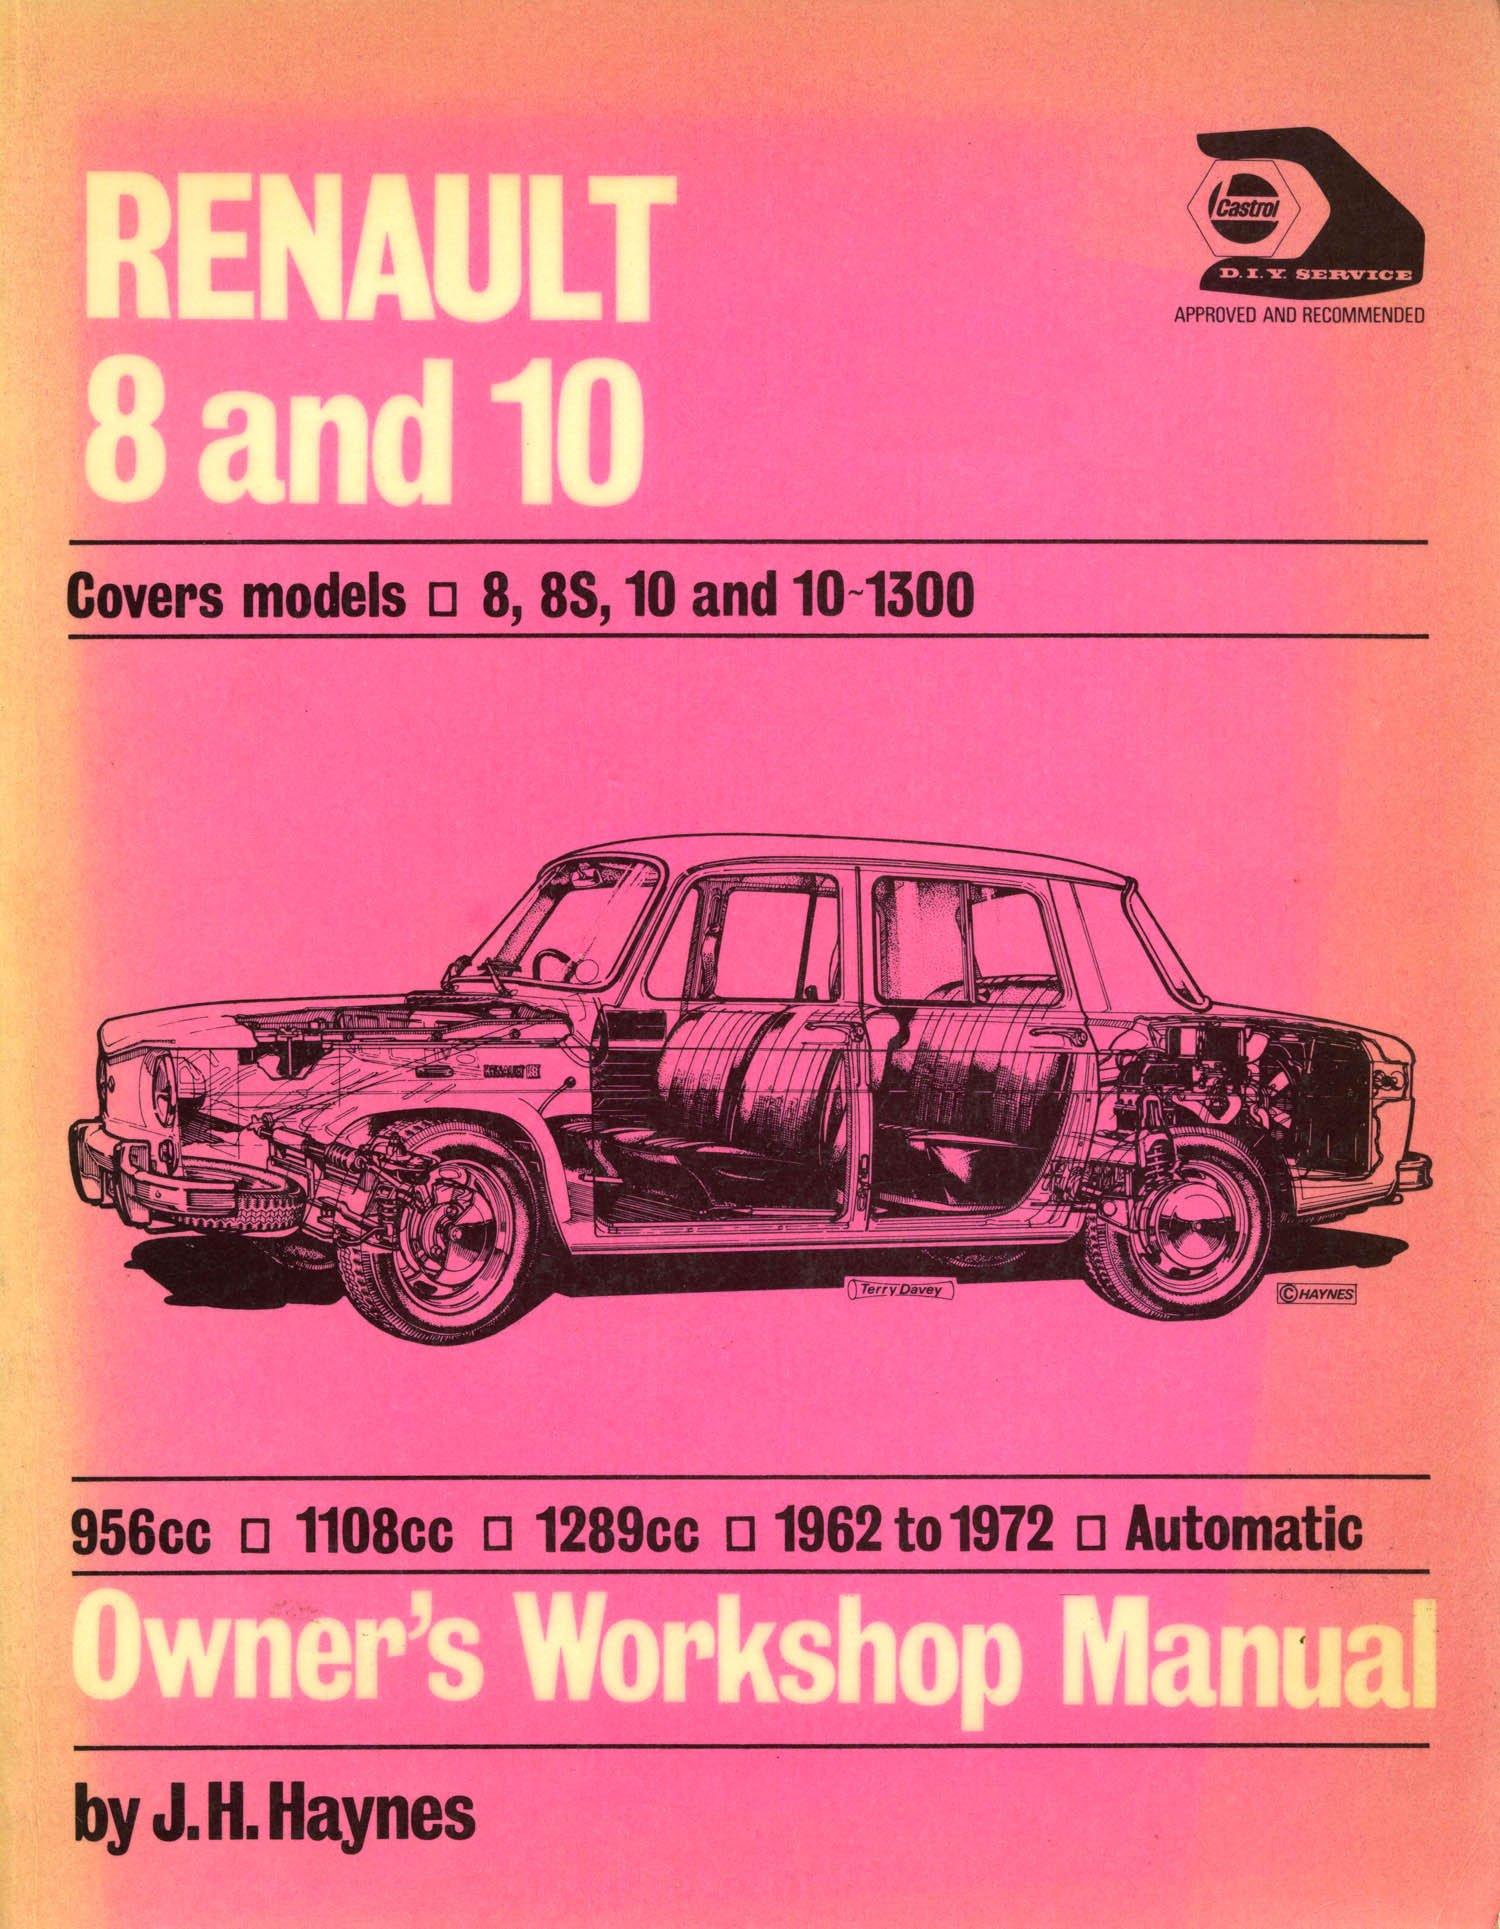 buy renault 8 and 10 owner s workshop manual book online at low rh amazon in Renault R31 Renault Megane 3